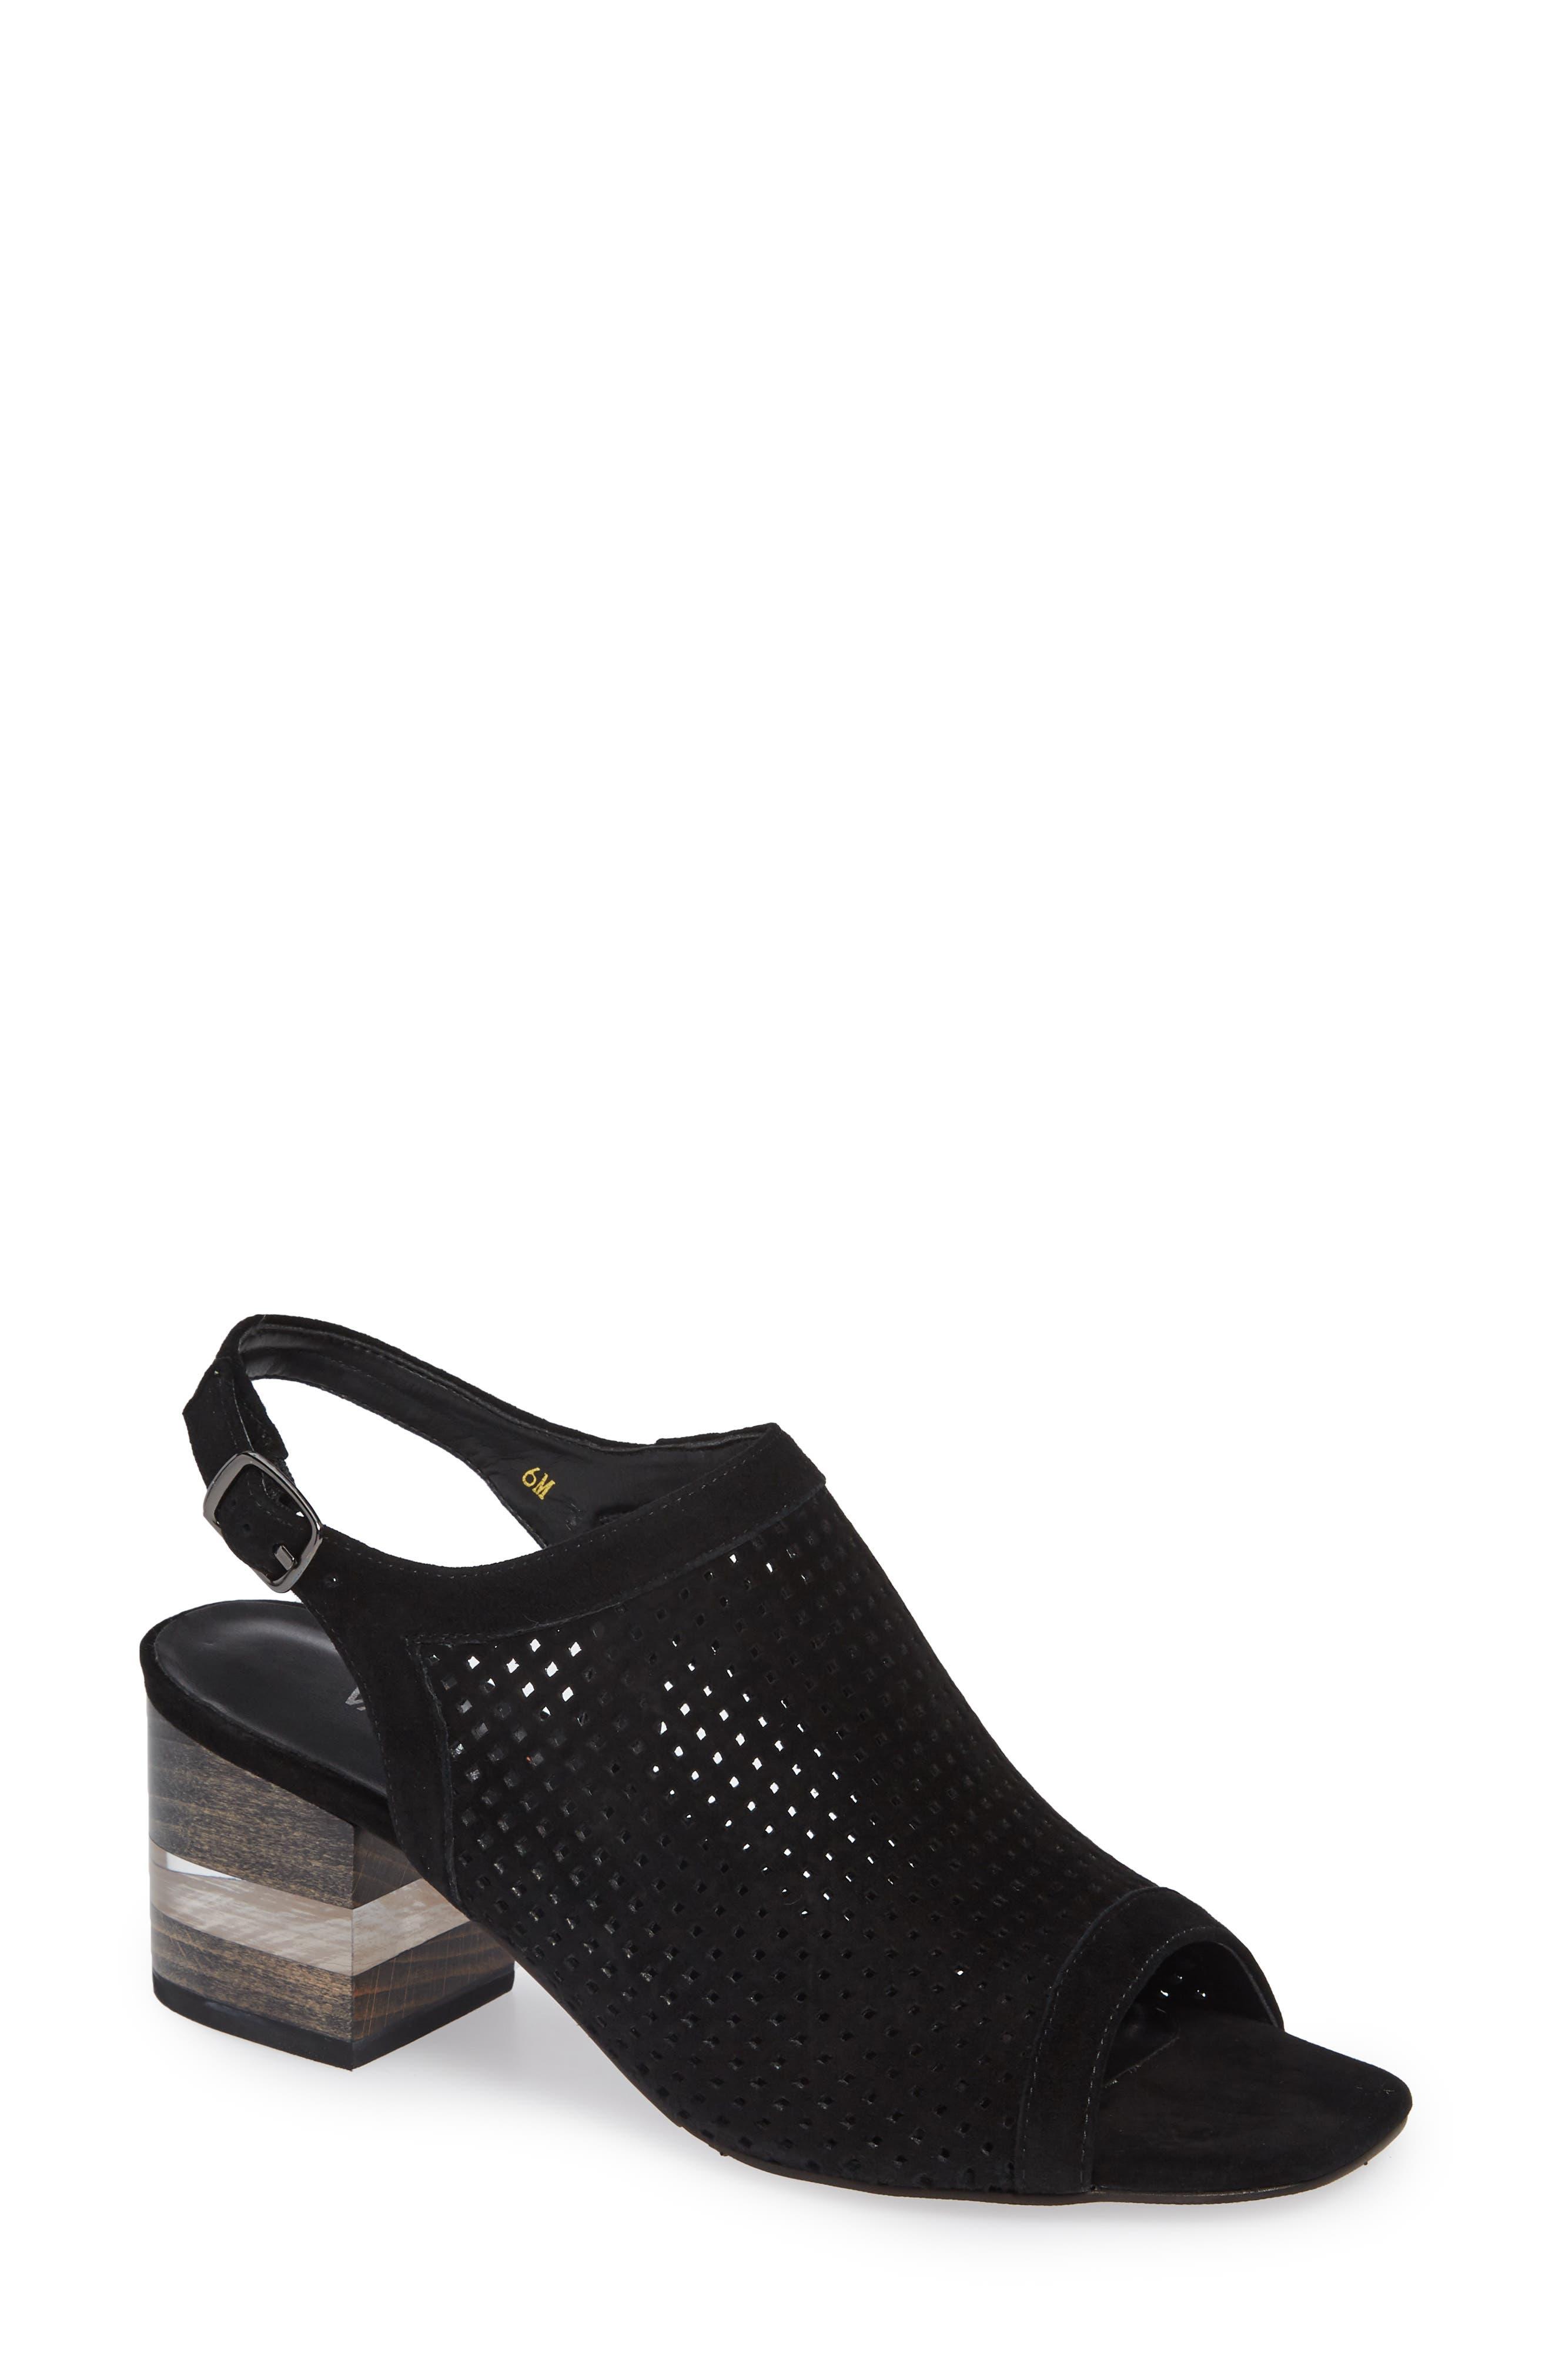 Elija Slingback Sandal,                         Main,                         color, BLACK PERFORATED SUEDE